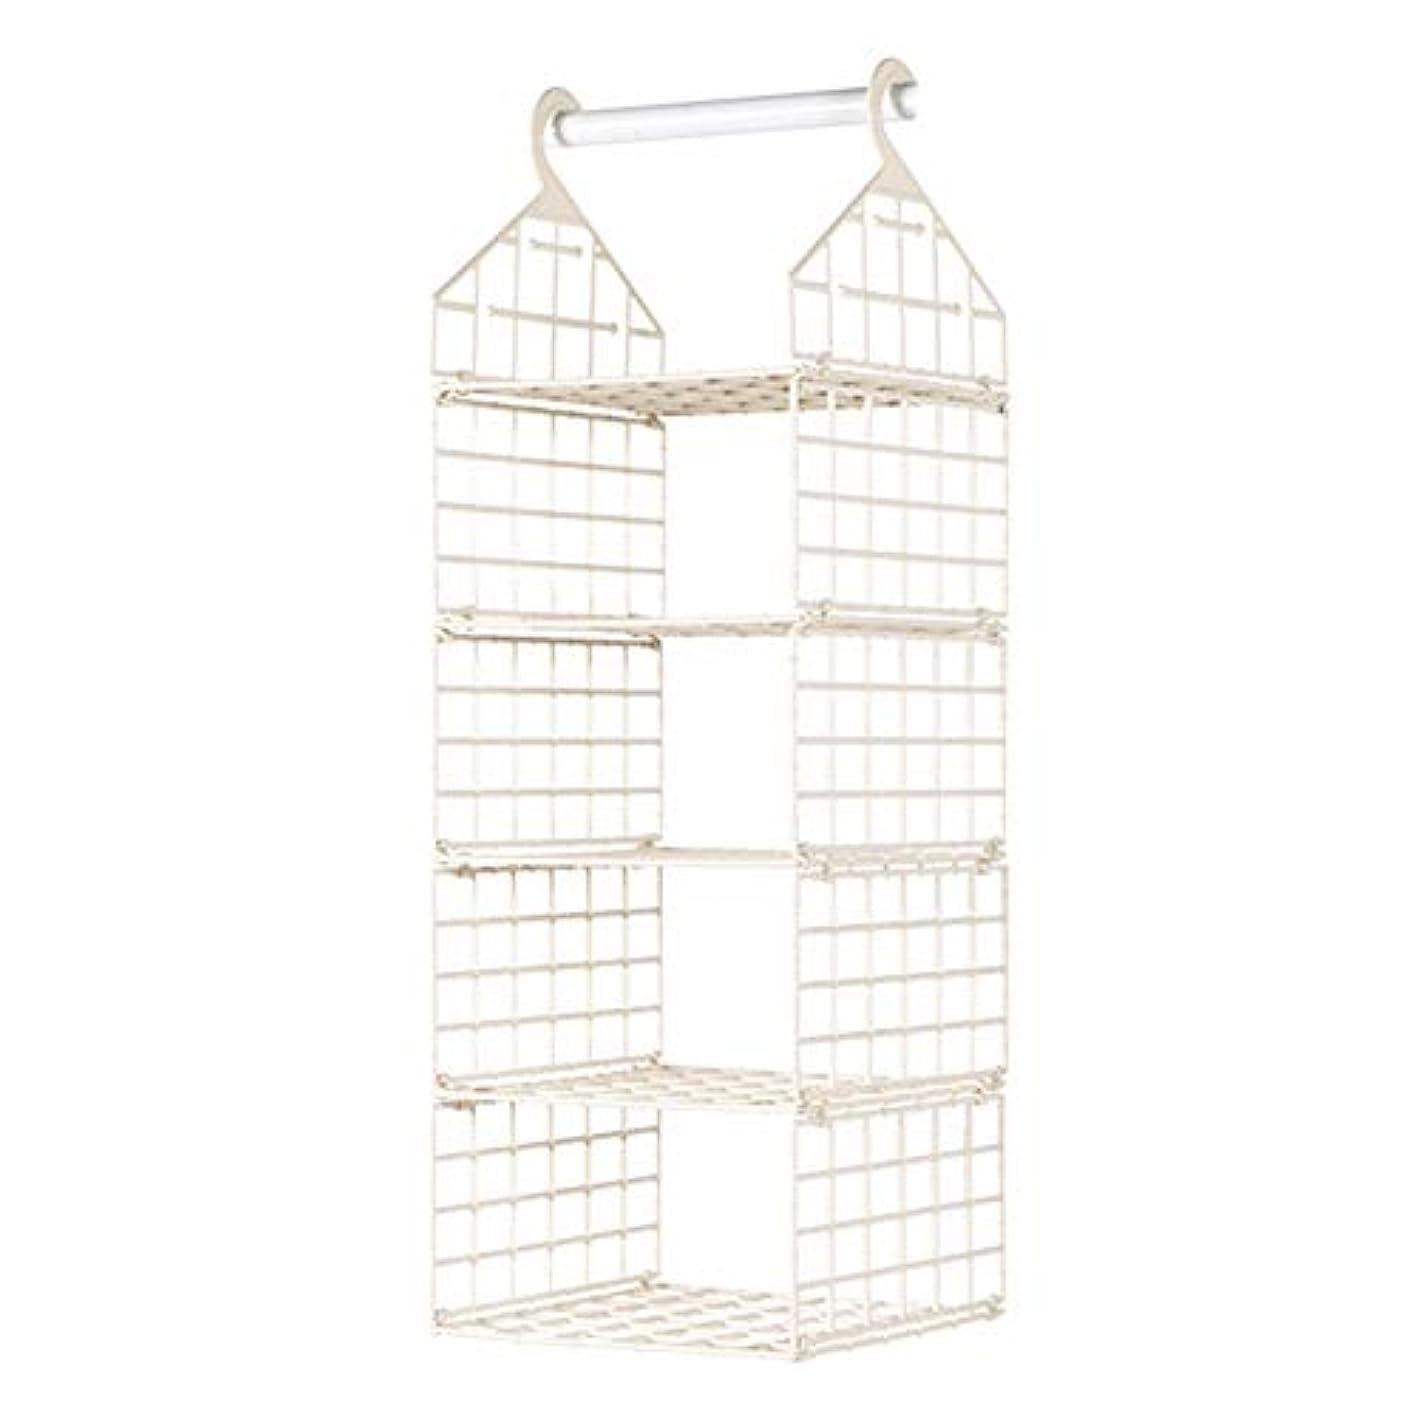 HINMA2 5-Shelf Hanging Closet Organizer, Hanging Clothes Storage Box, Closet Hanging Shelf,Sweater & Handbag Organizer, Shoes Accessories Storage,Easy Mount(Beige)